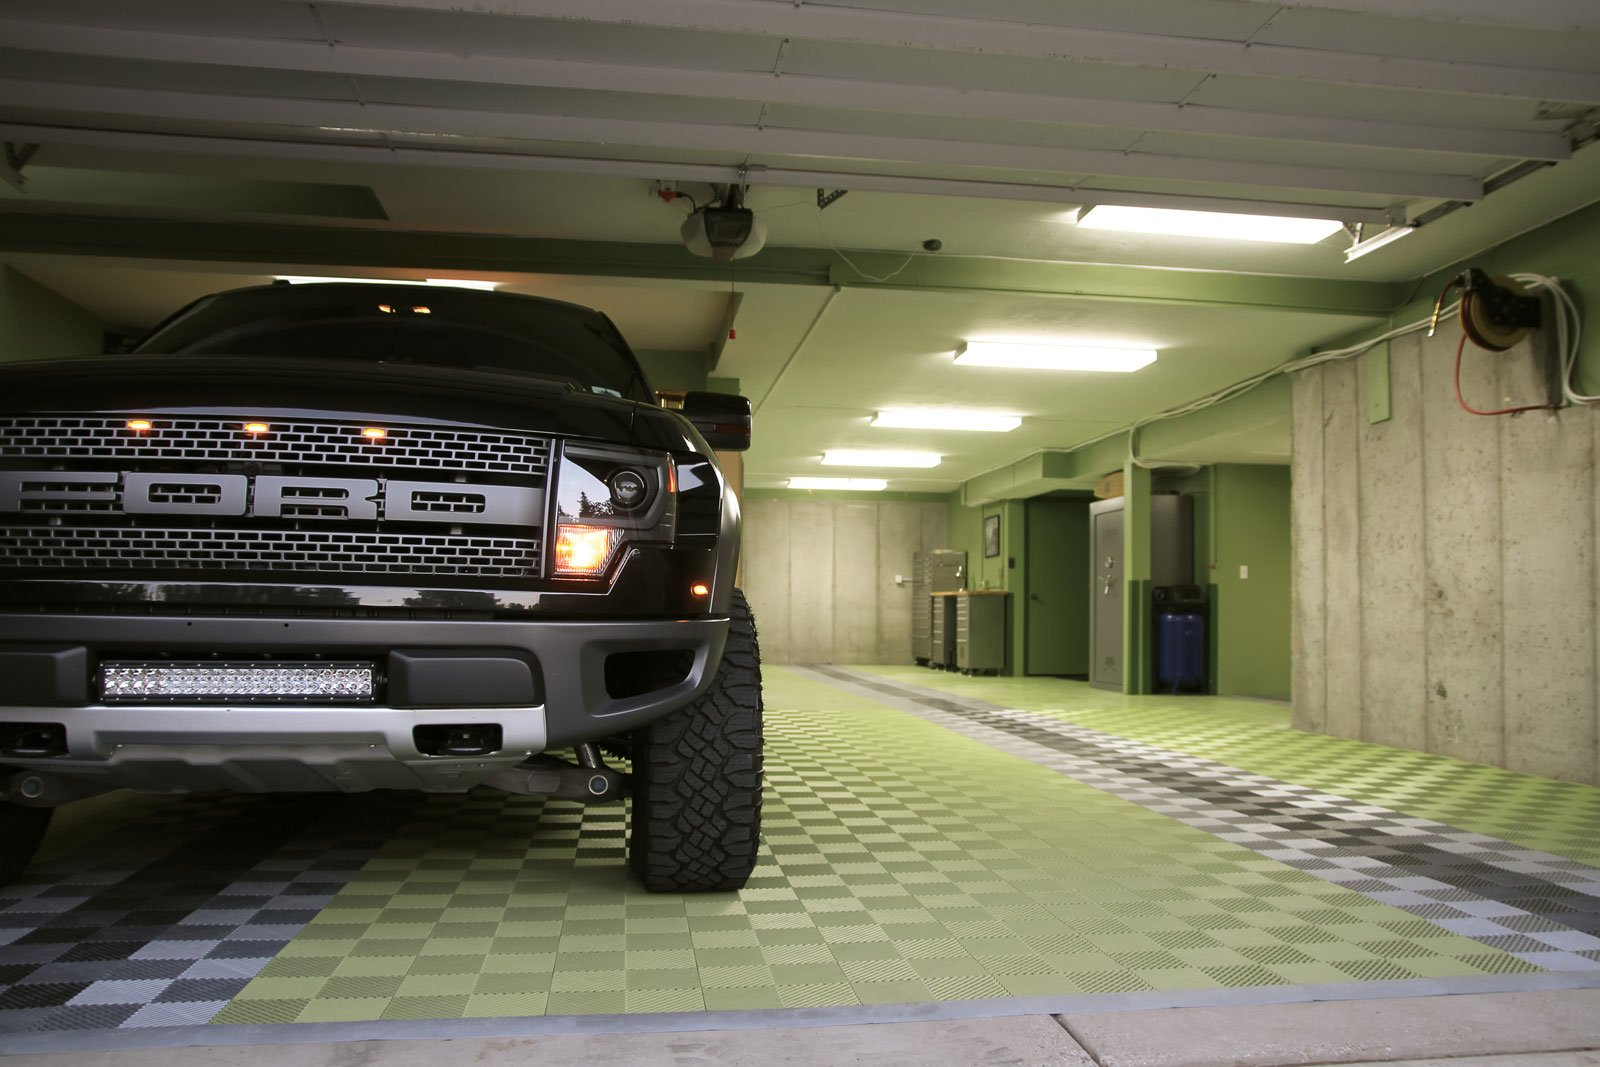 RaceDeck Free-Flow Open Rib Design, Durable Interlocking Modular Garage Flooring Tile (48 Pack), Graphite by RaceDeck (Image #10)